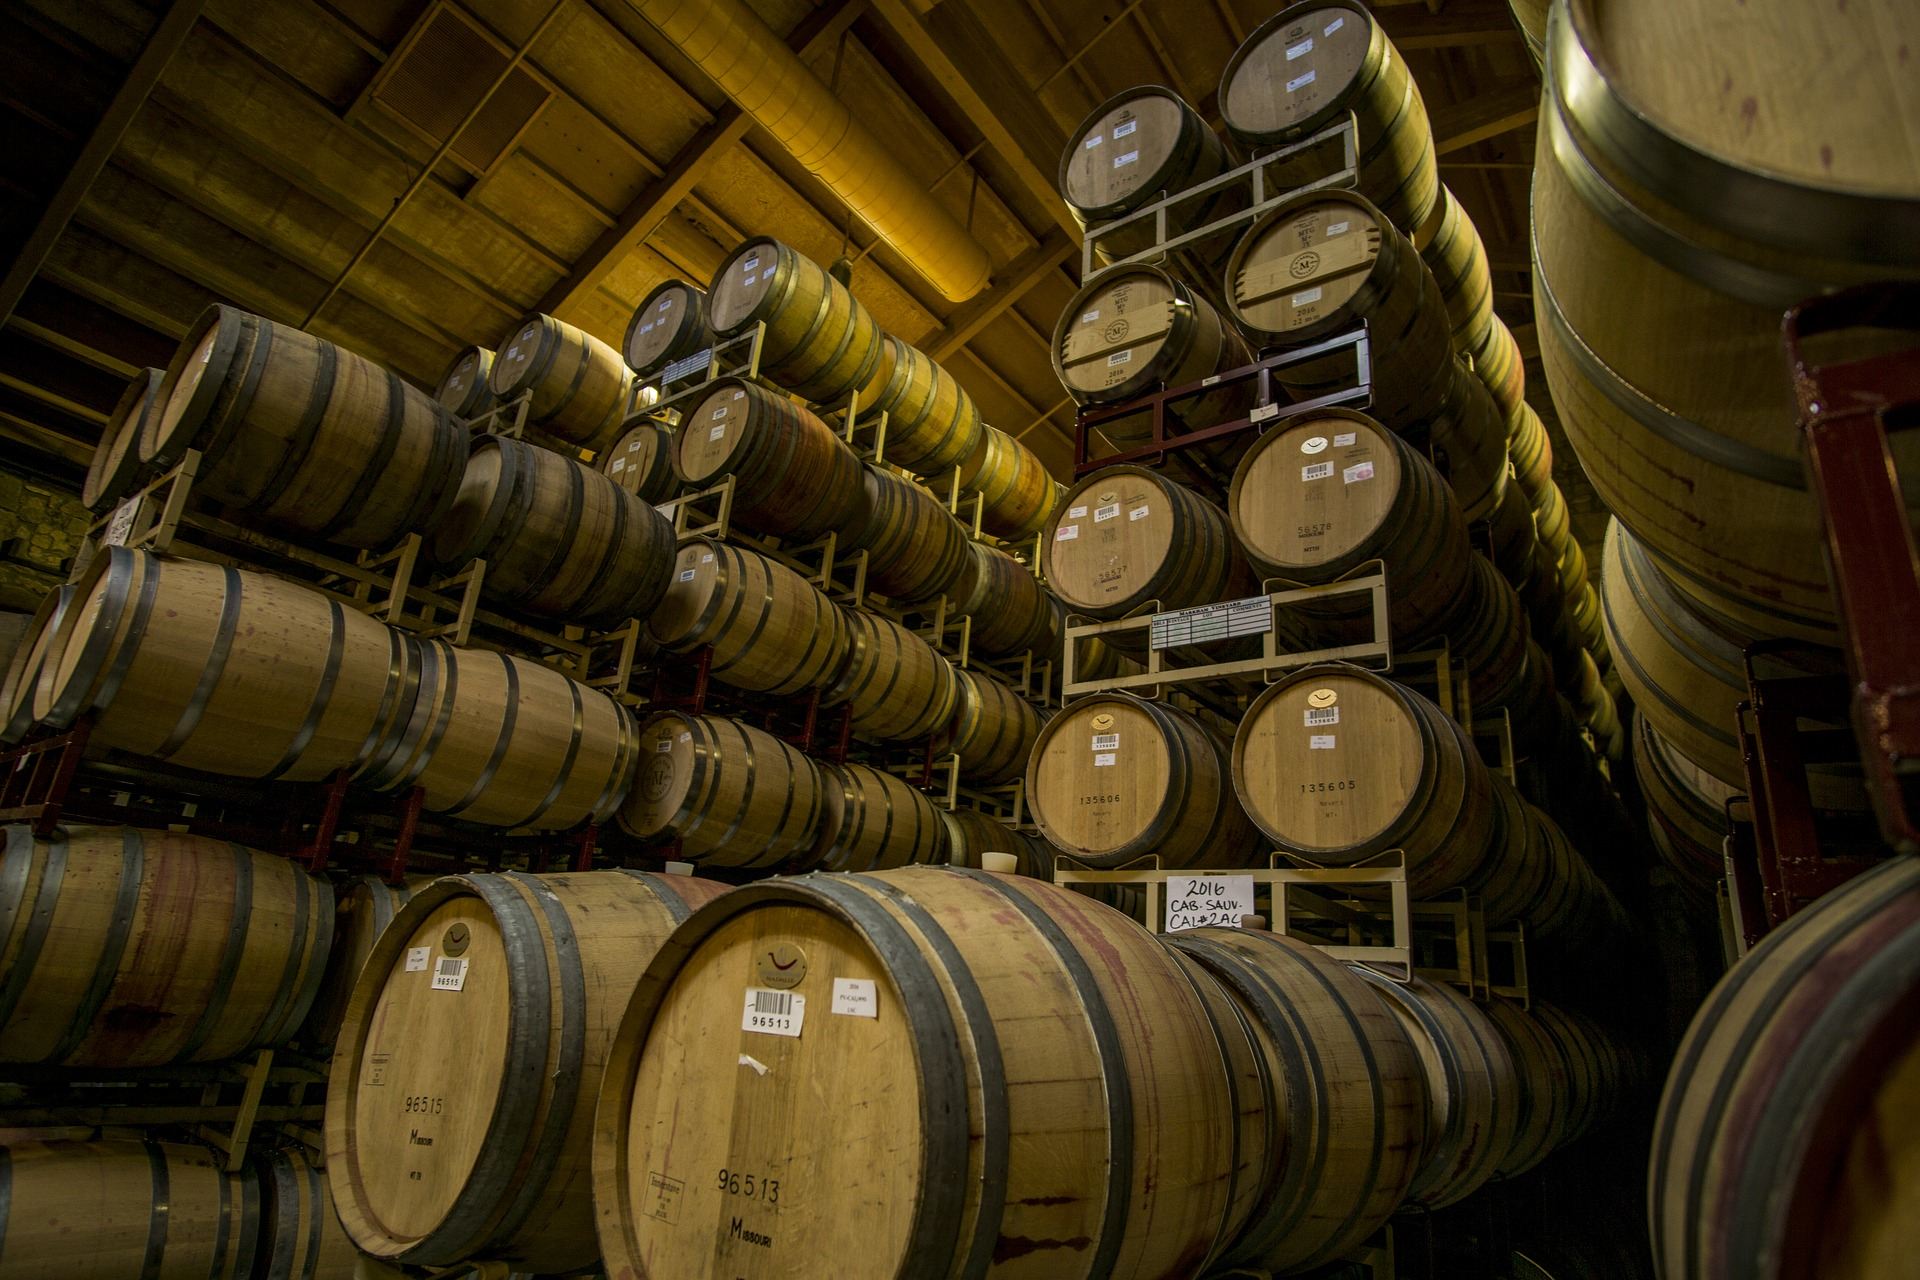 Stacks of barrels that are two barrels wide and five barrels high. - TAB Bank